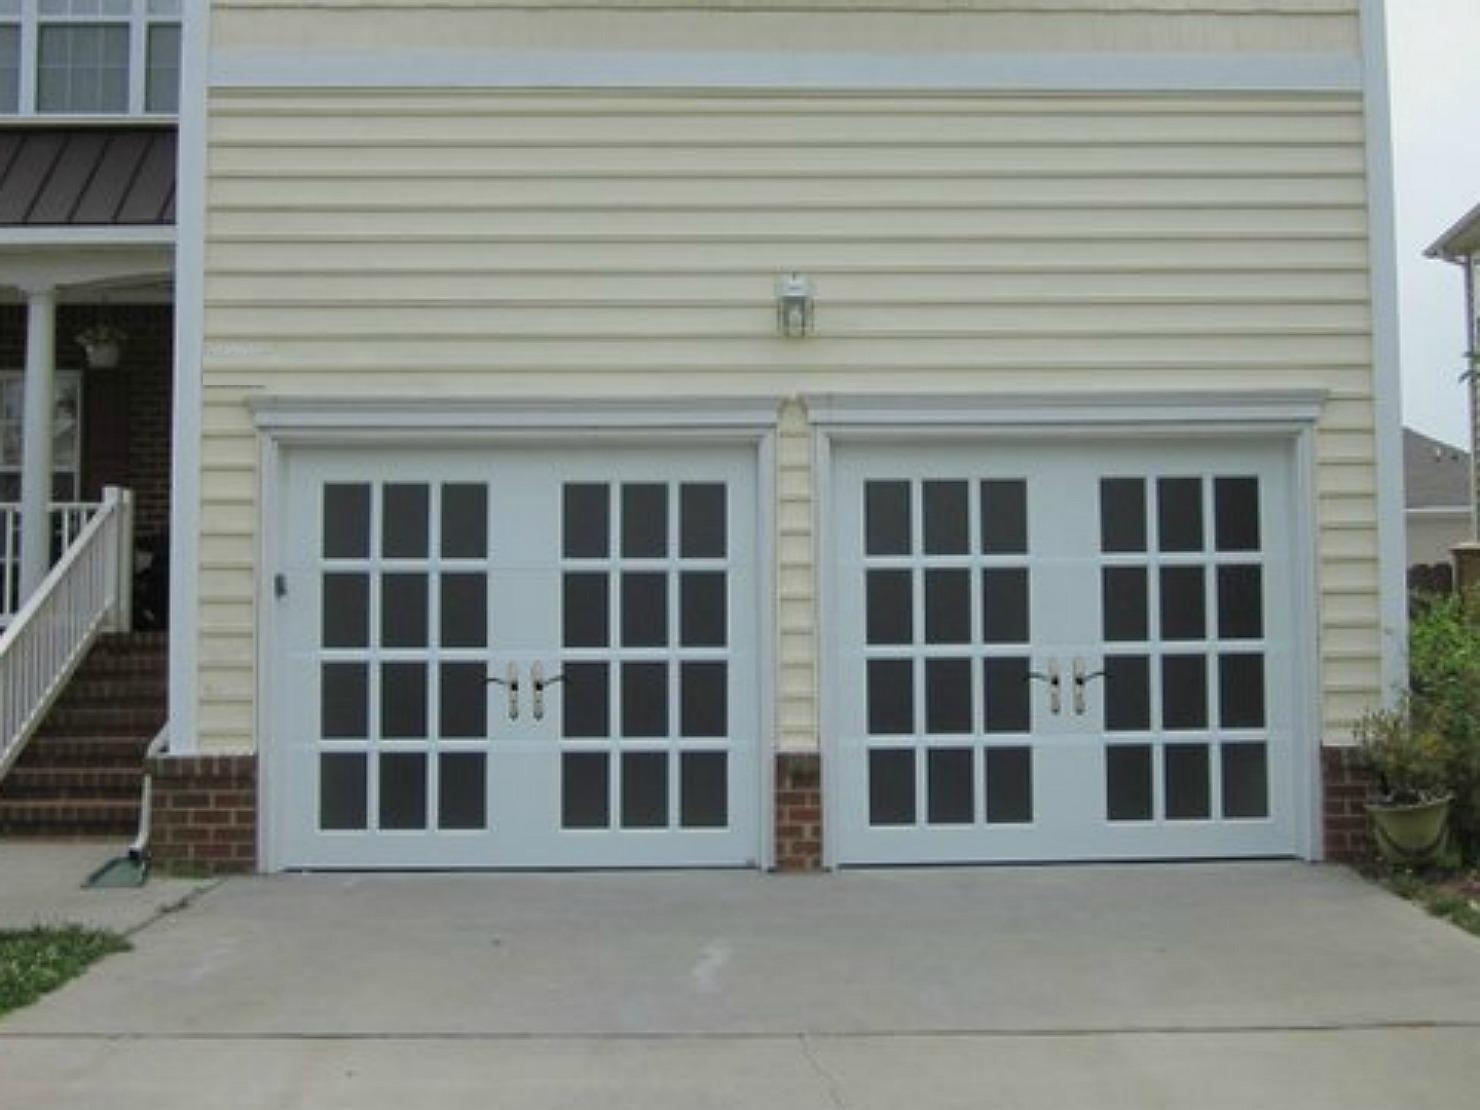 5 Unique Garage Door Designs